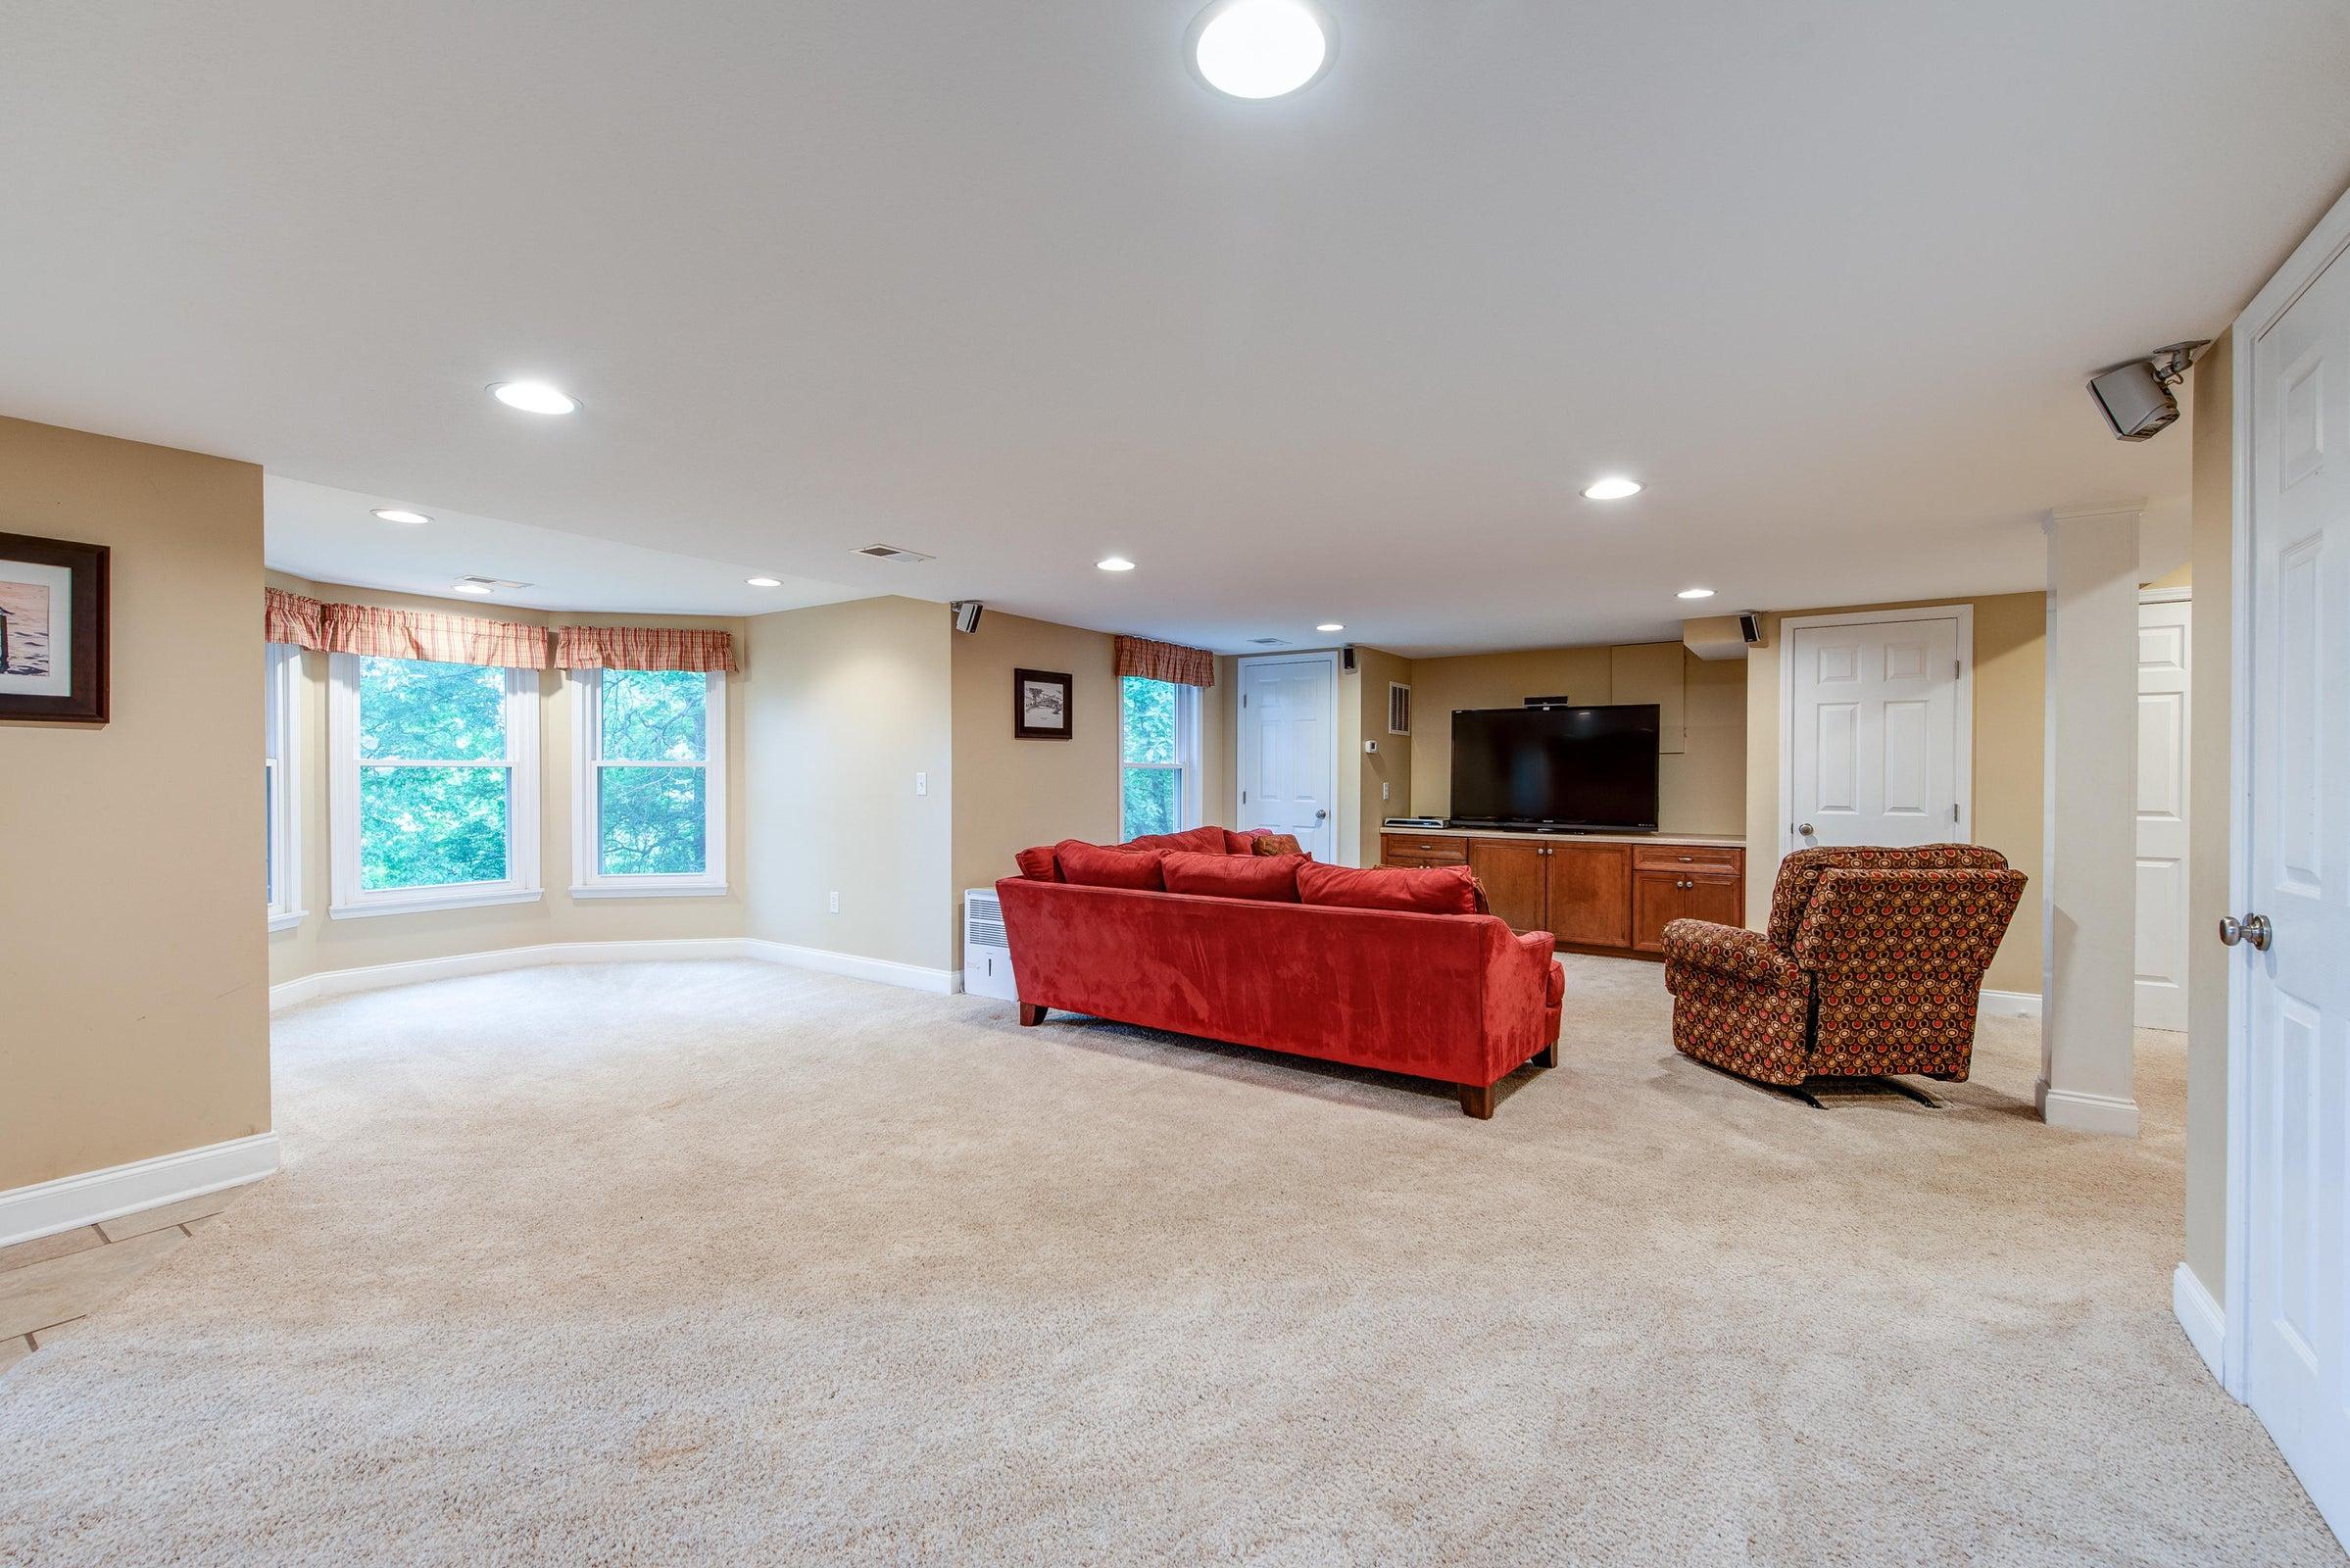 basement - looking southwest